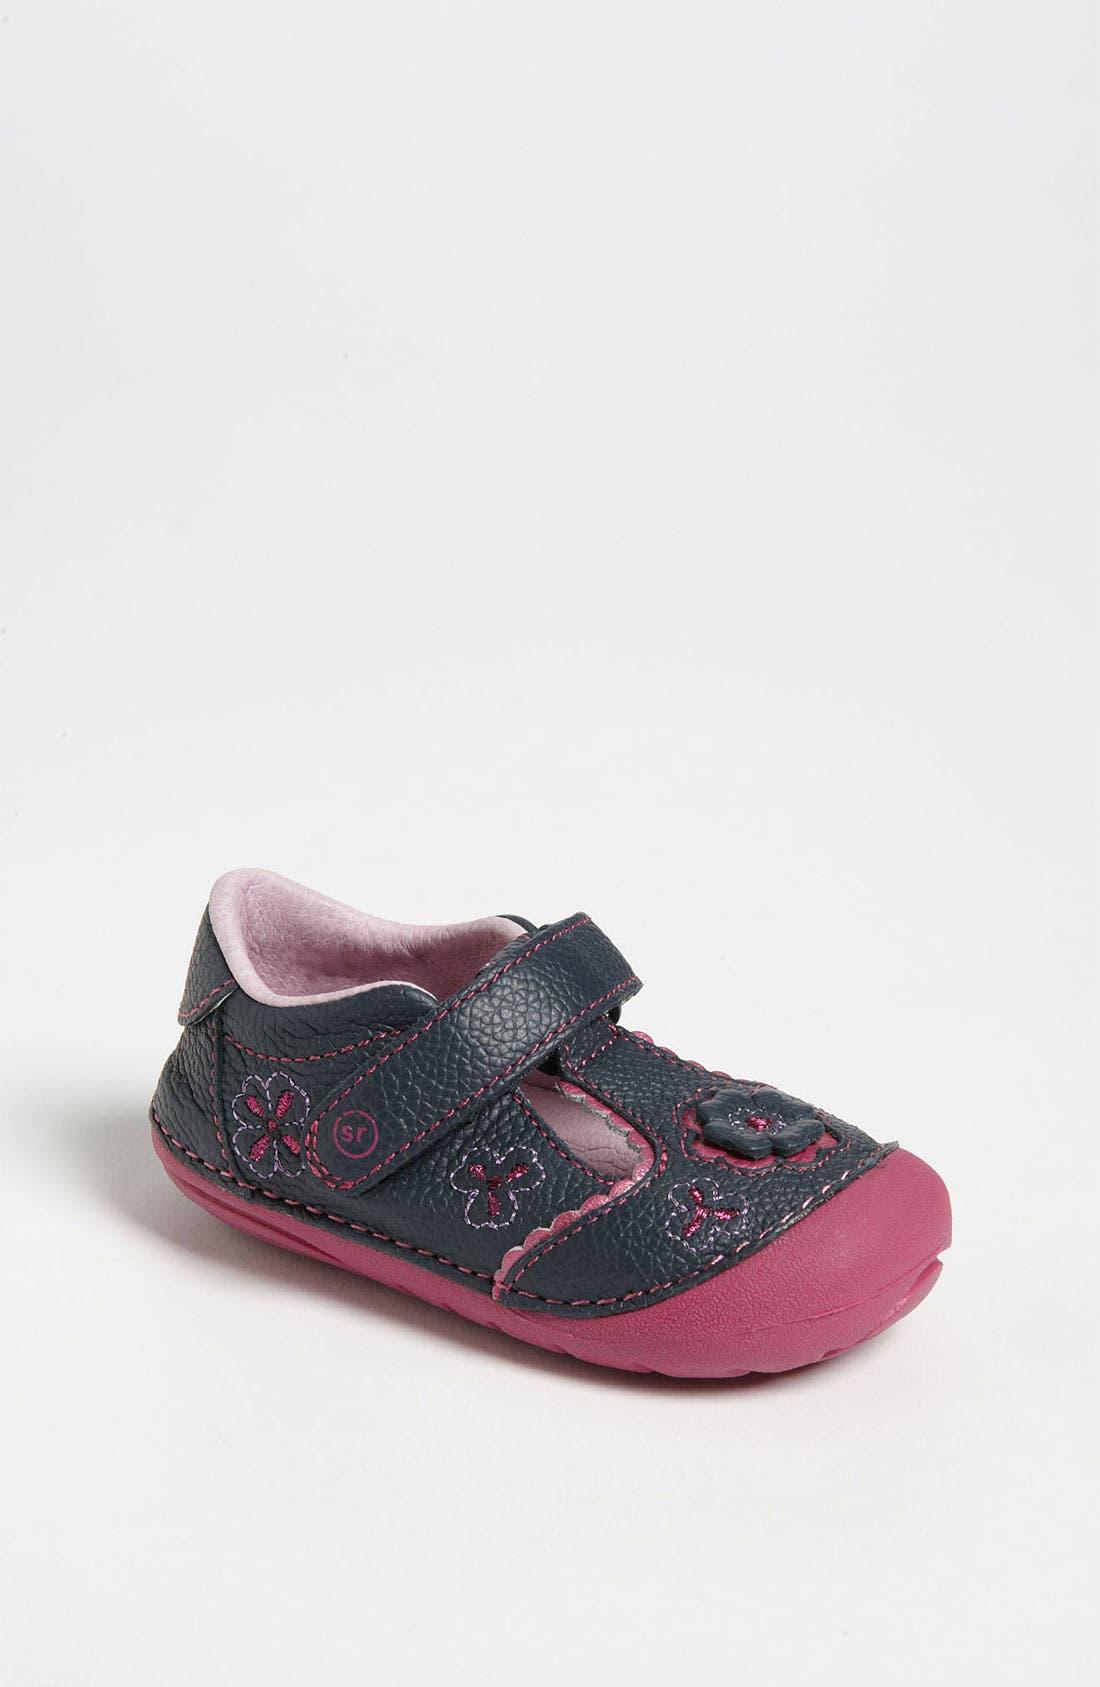 Main Image - Stride Rite 'Mae' Sandal (Baby & Walker)